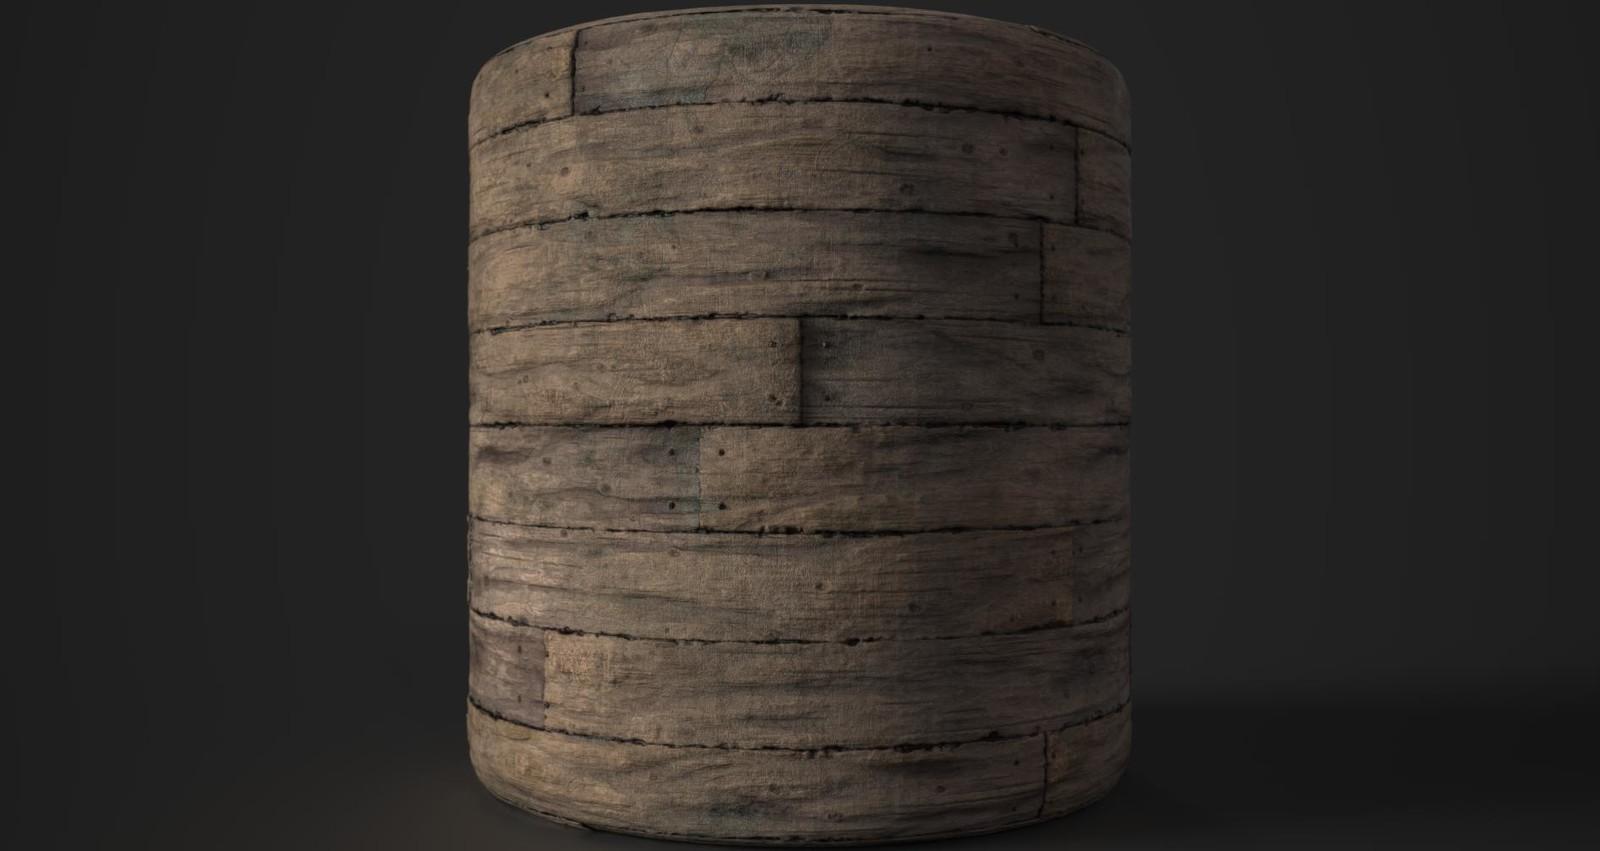 Rotten worn wood panelling or floor.